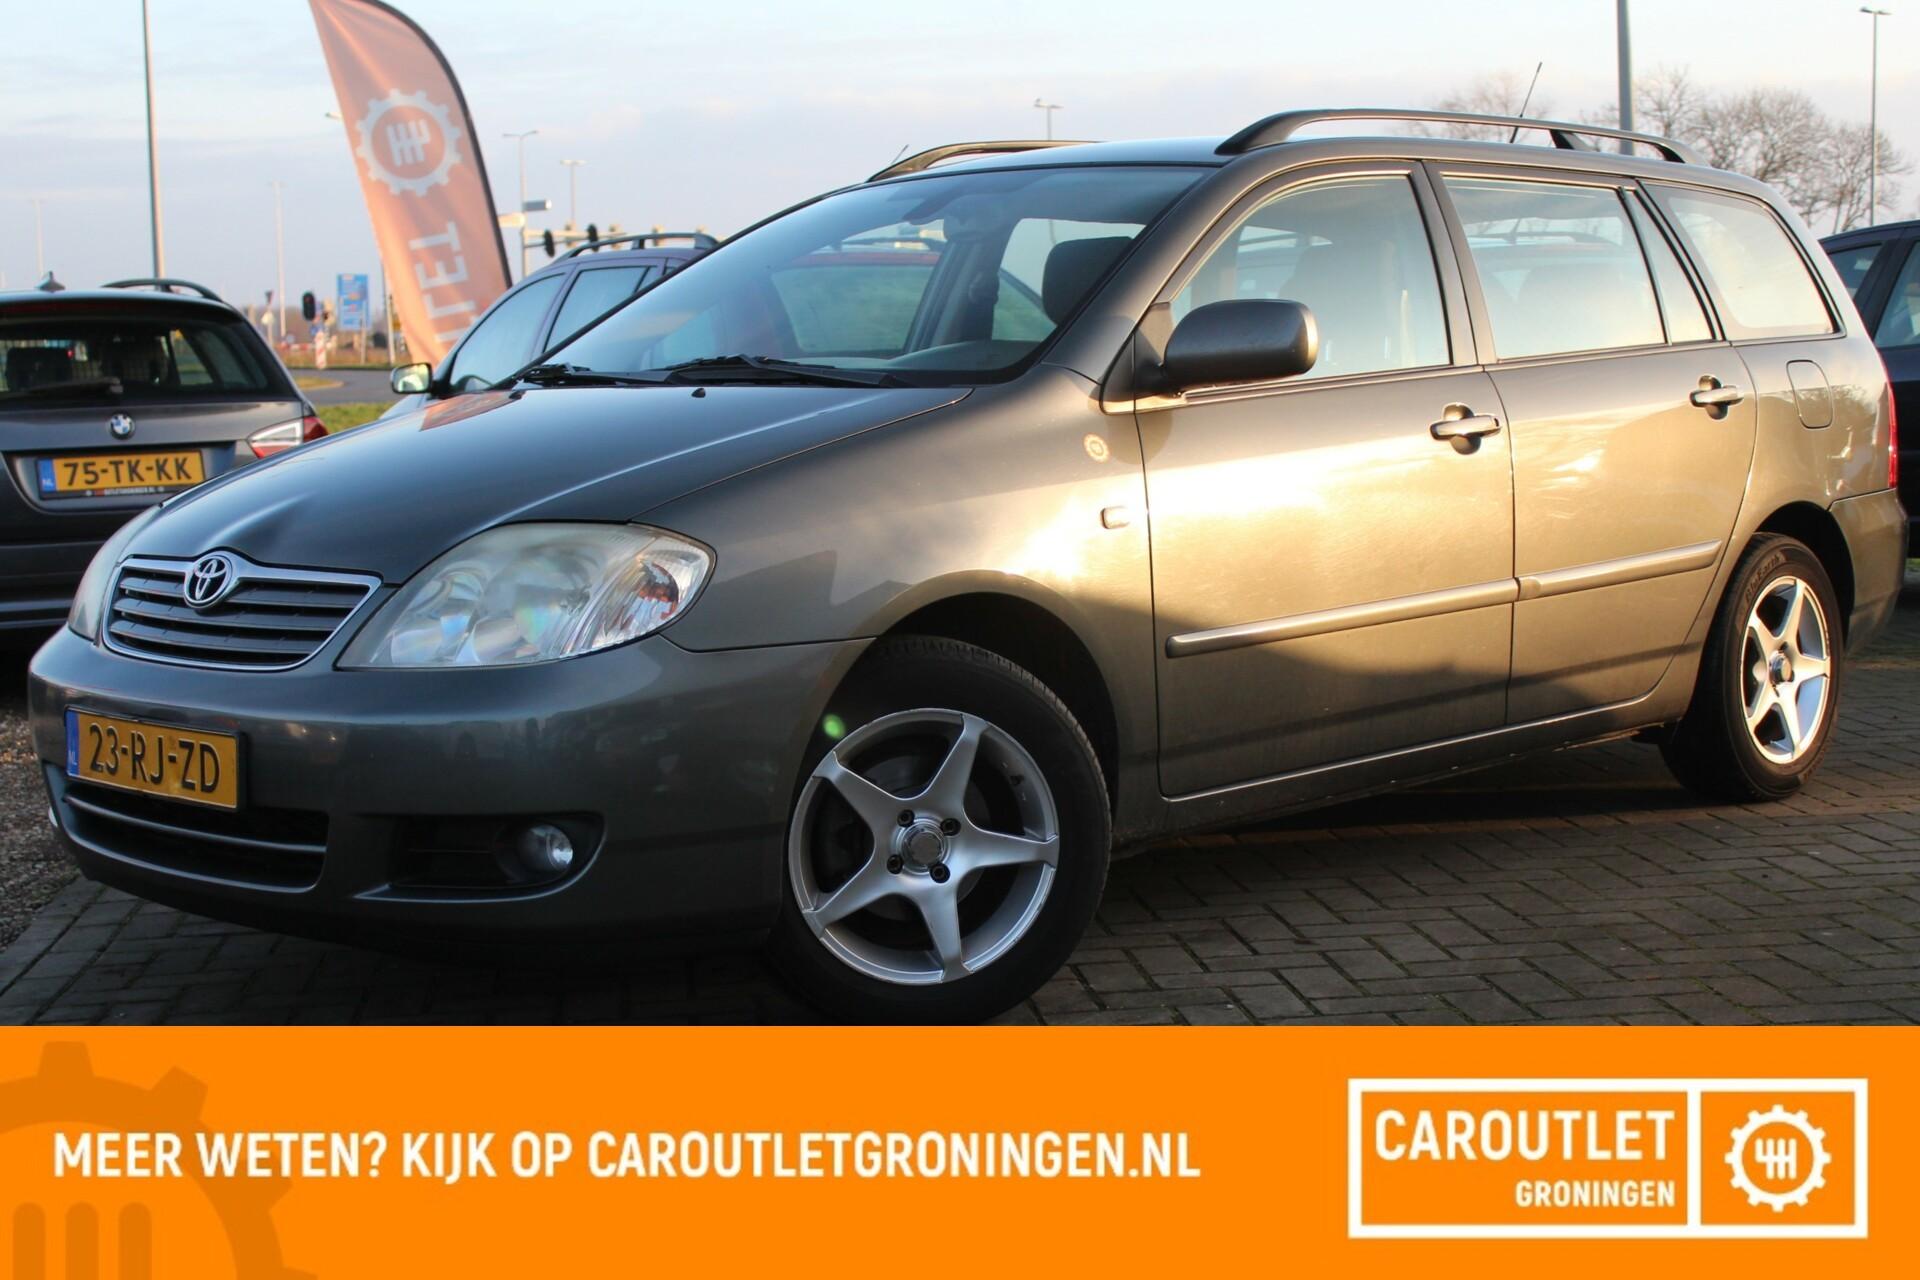 Caroutlet Groningen - Toyota Corolla Wagon 1.6 VVT-i Linea Sol | DEALER OH | CLIMA | CRUISE